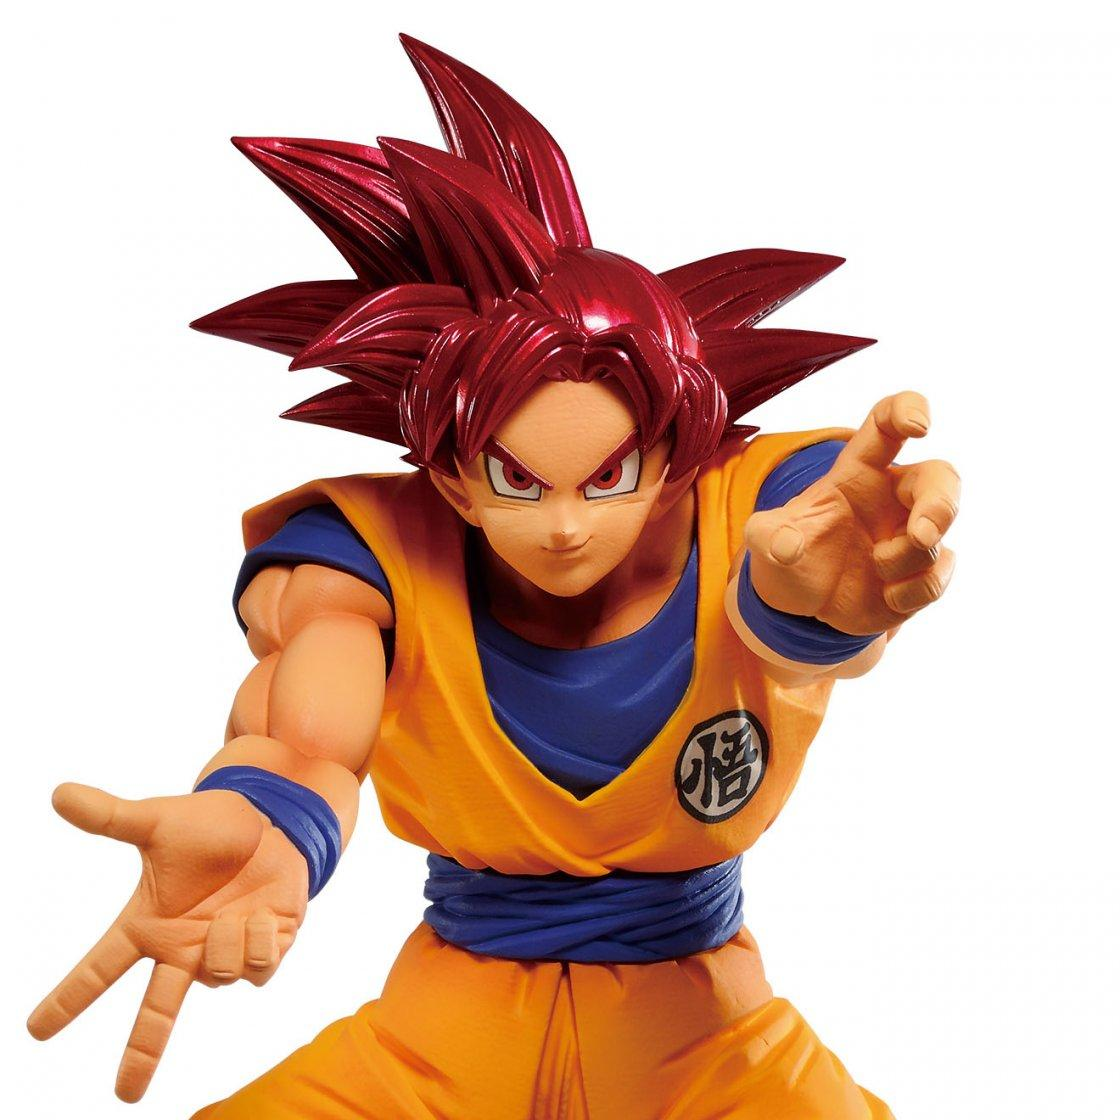 Figurine maximatic the son goku v dragon ball super